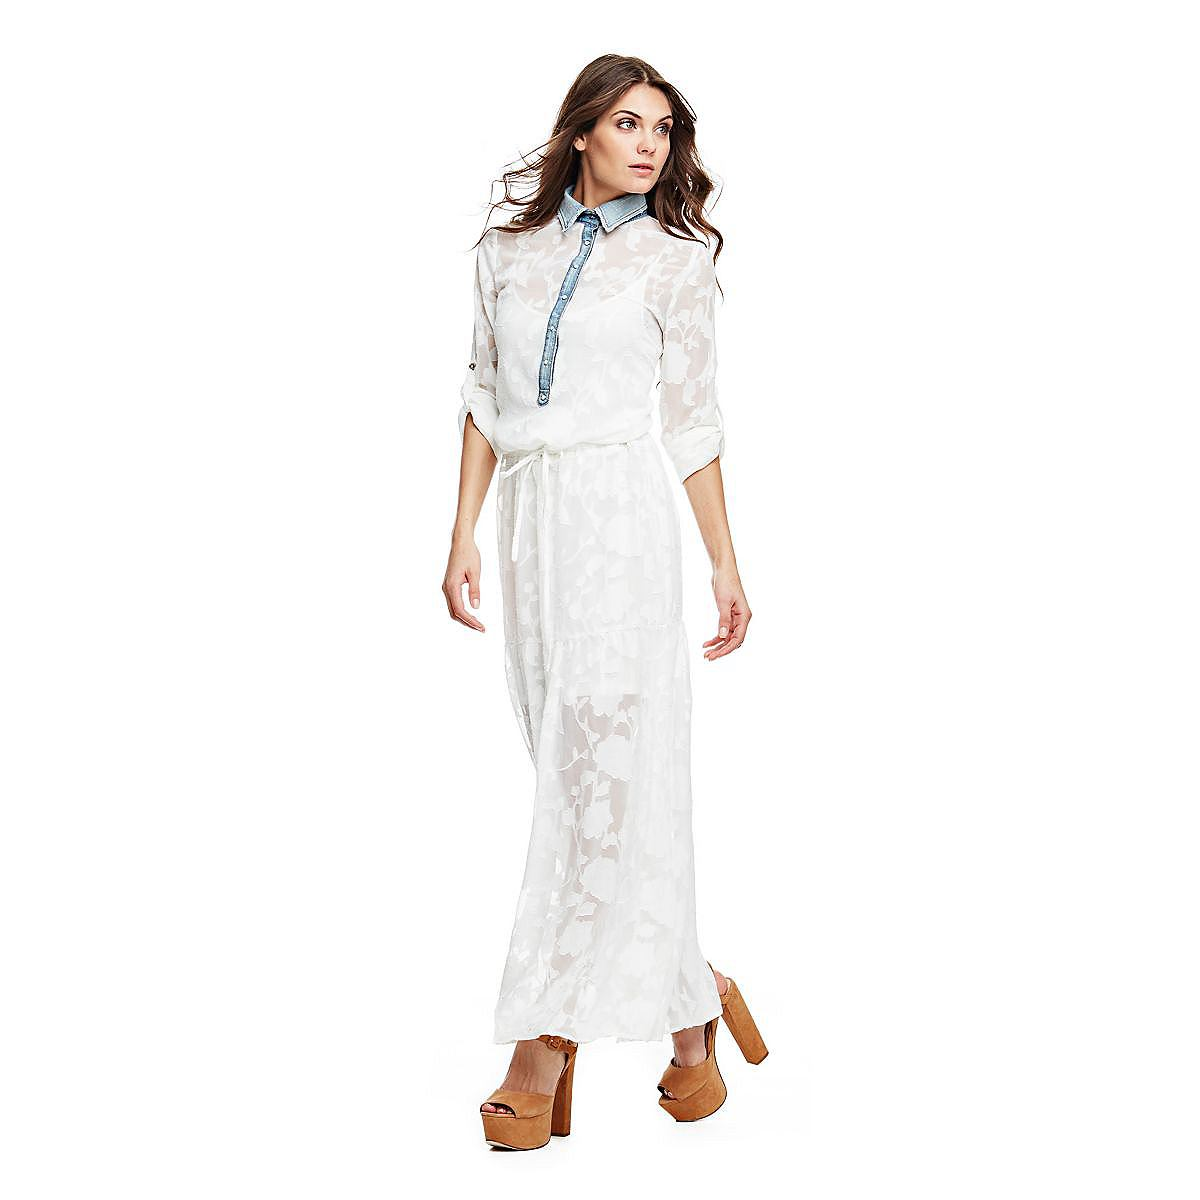 Guess lange jurk in etskant-look wit